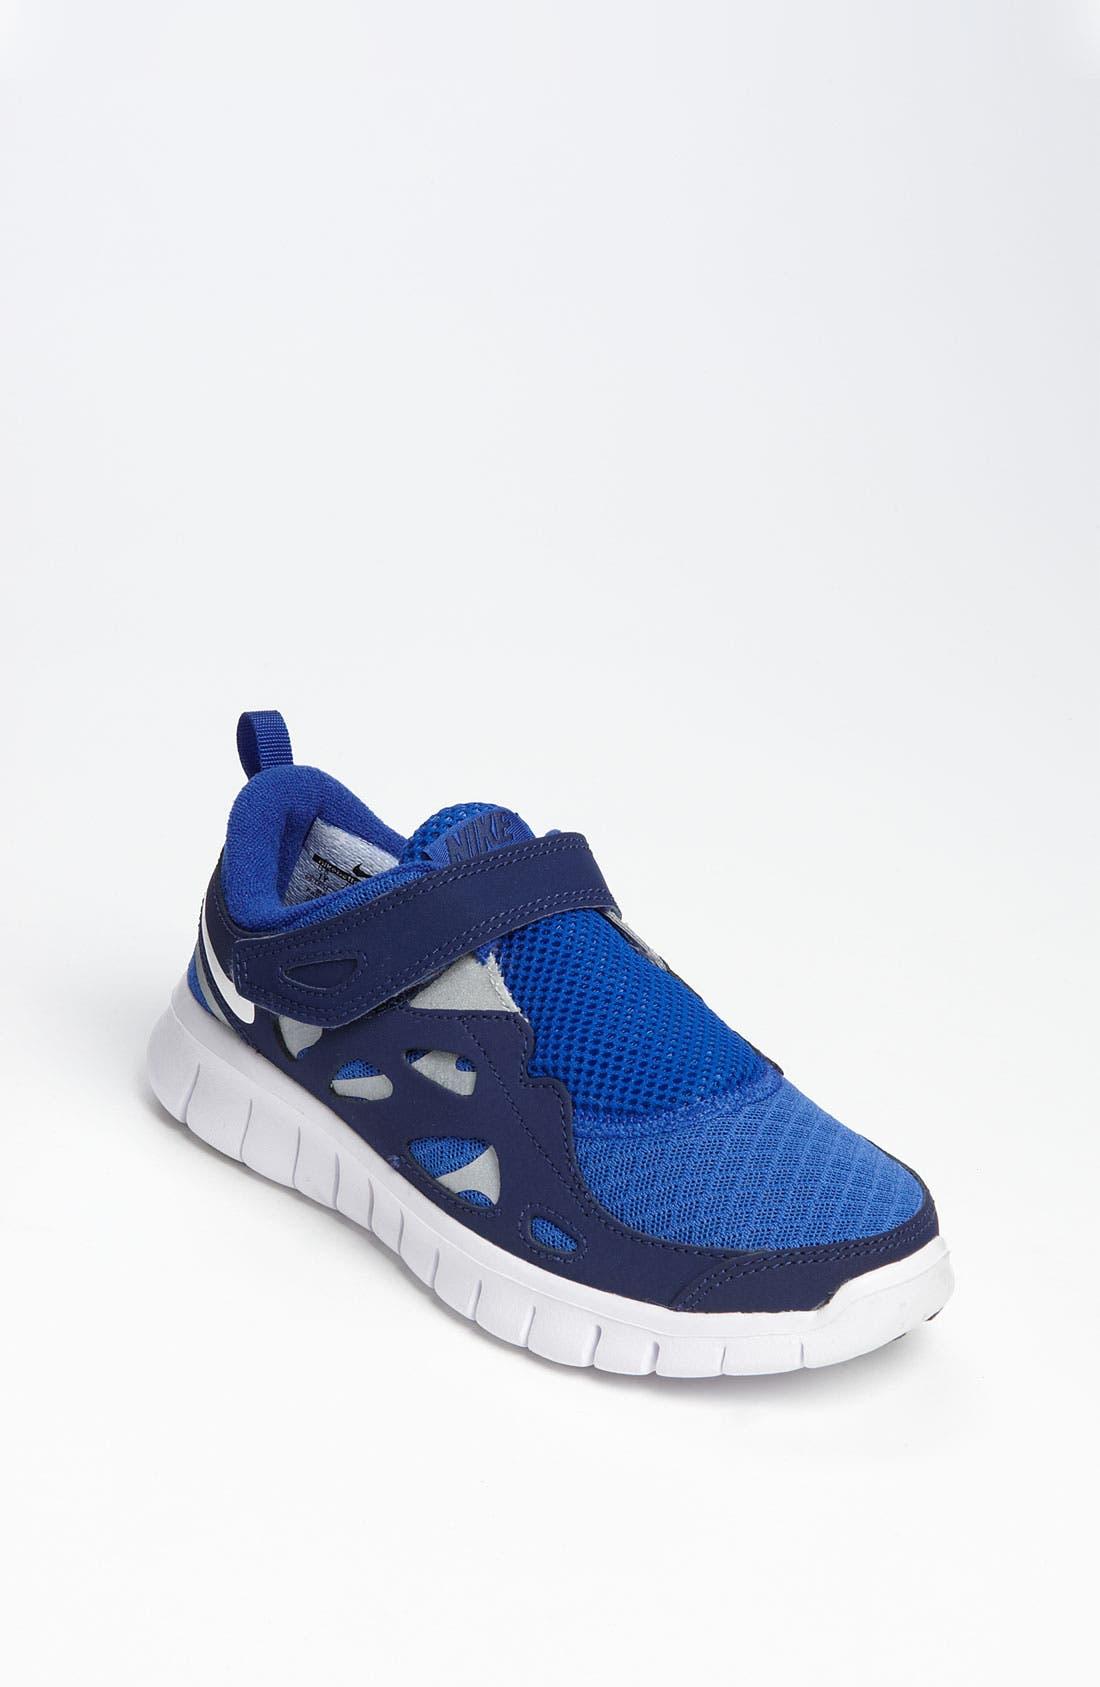 Alternate Image 1 Selected - Nike 'Free Run 2.0' Running Shoe (Baby, Walker, Toddler & Little Kid)